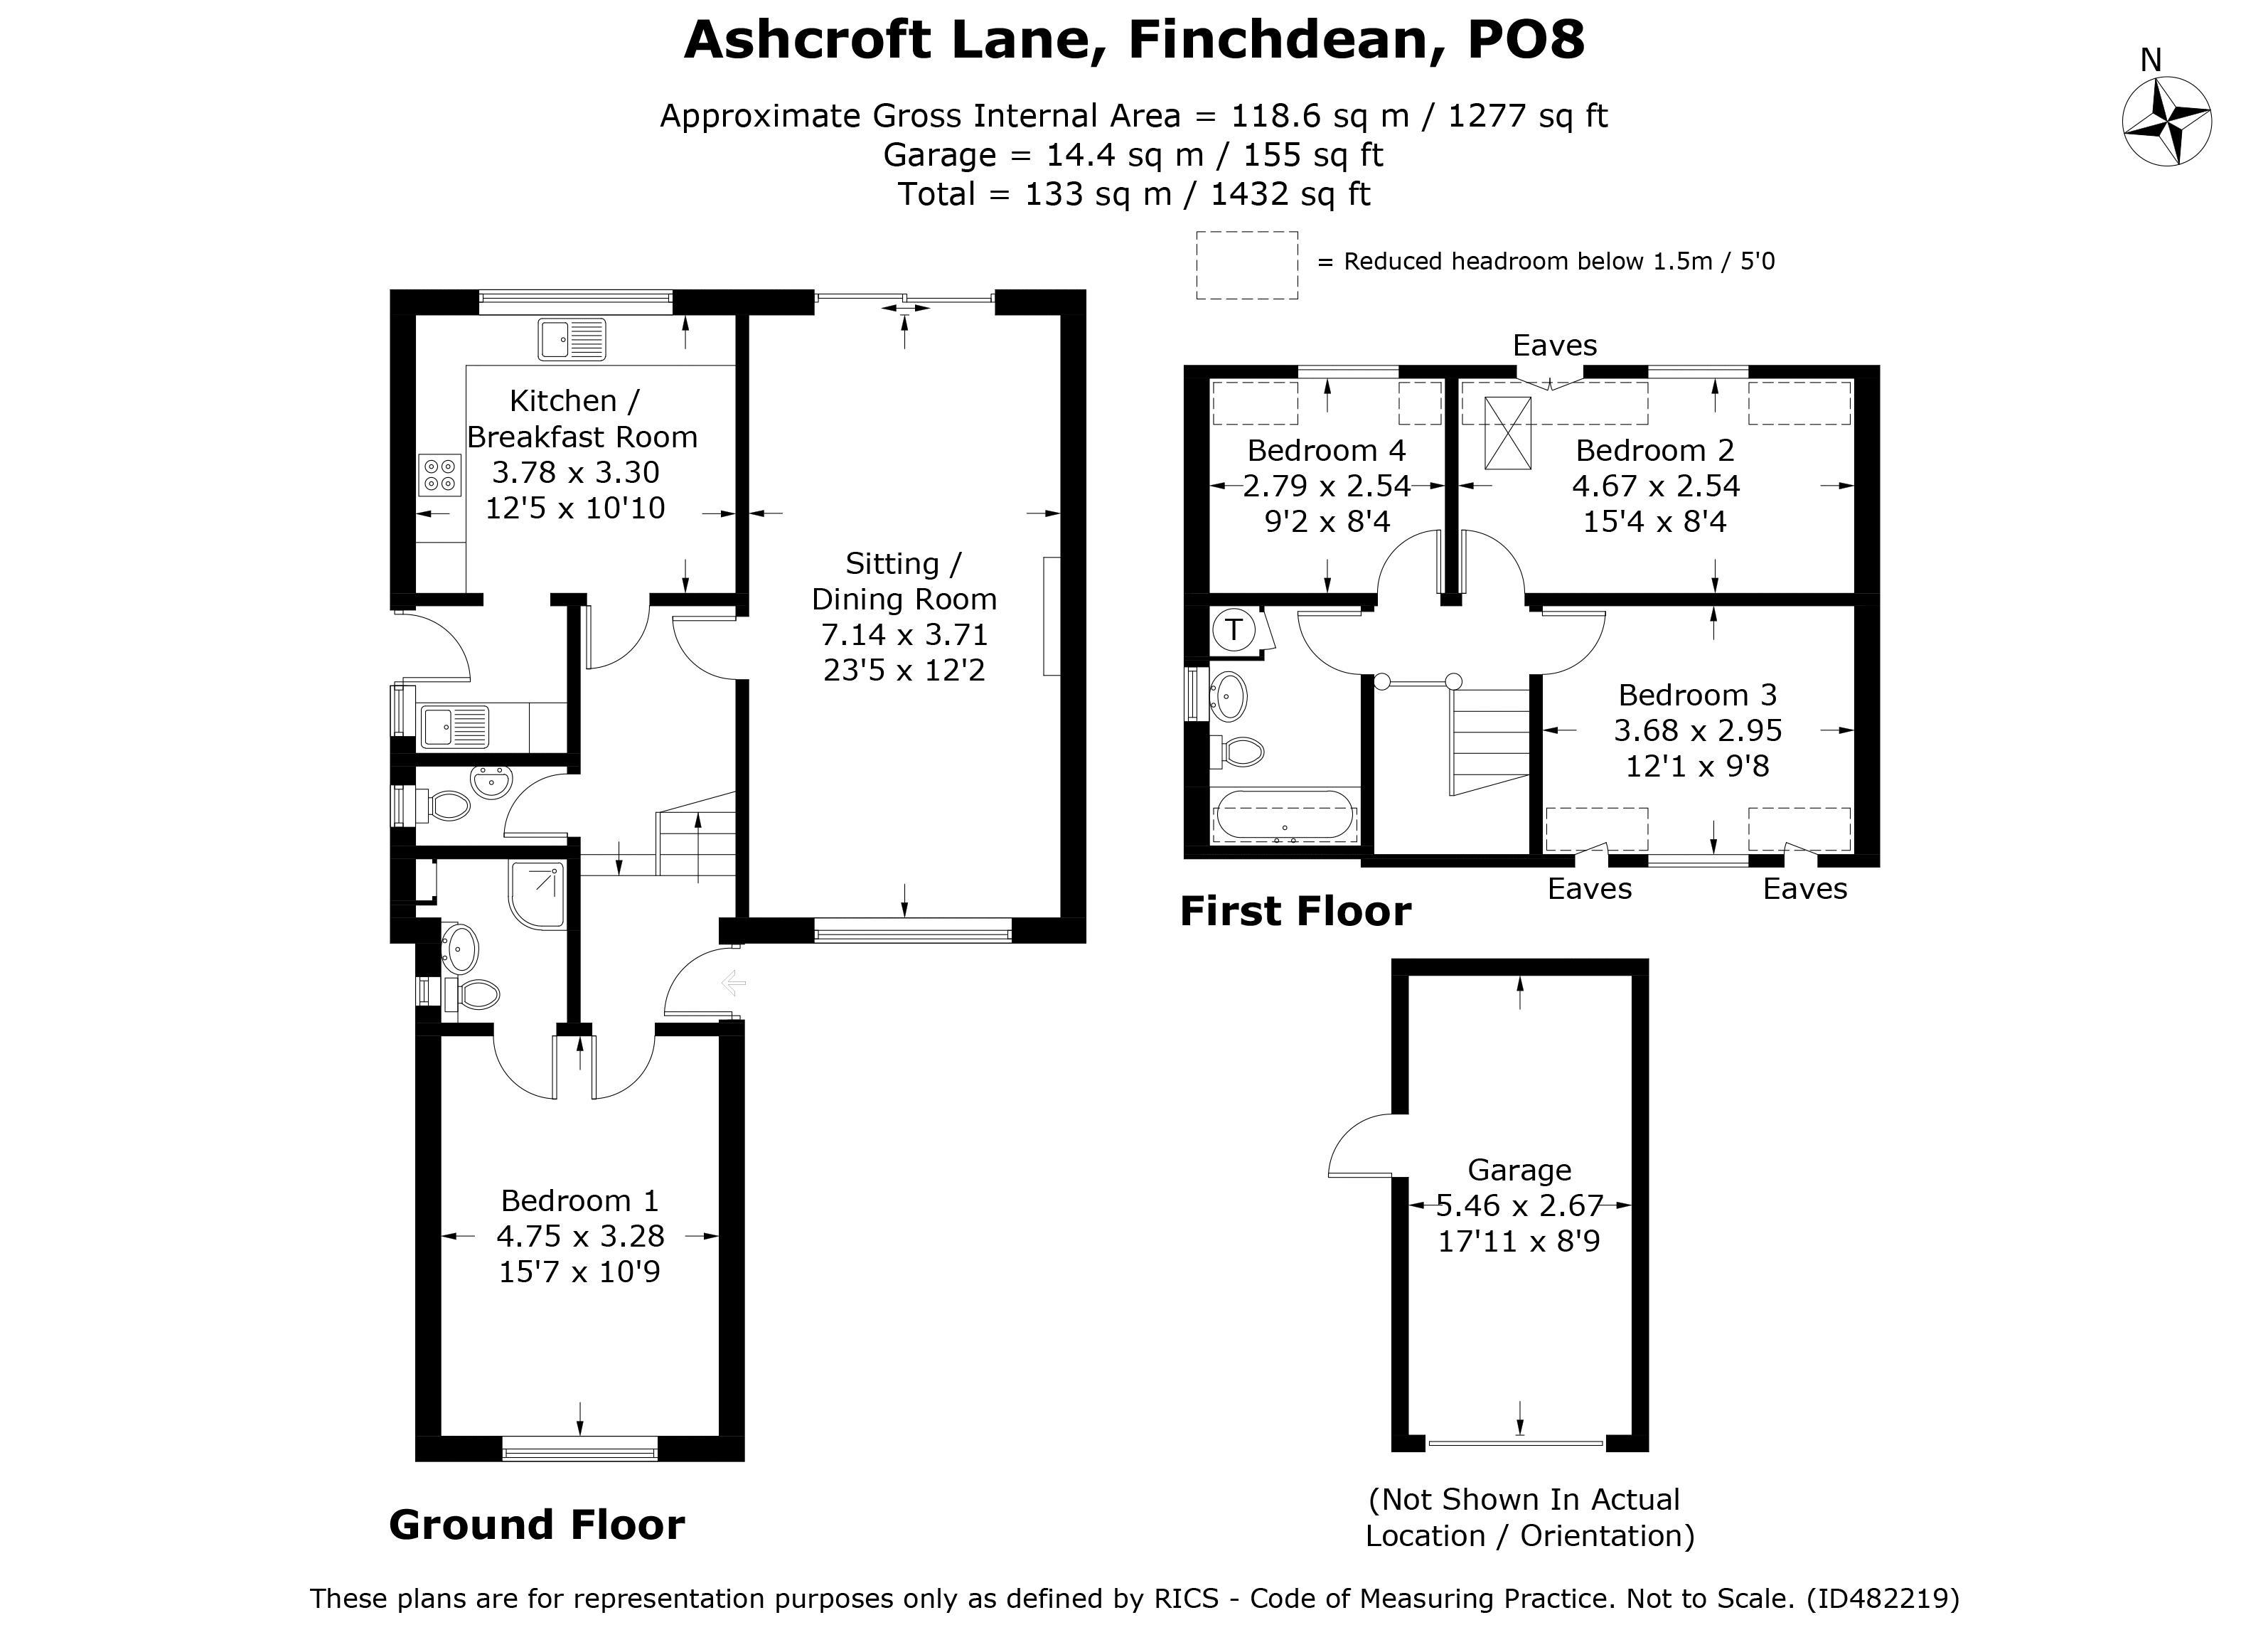 Ashcroft Lane